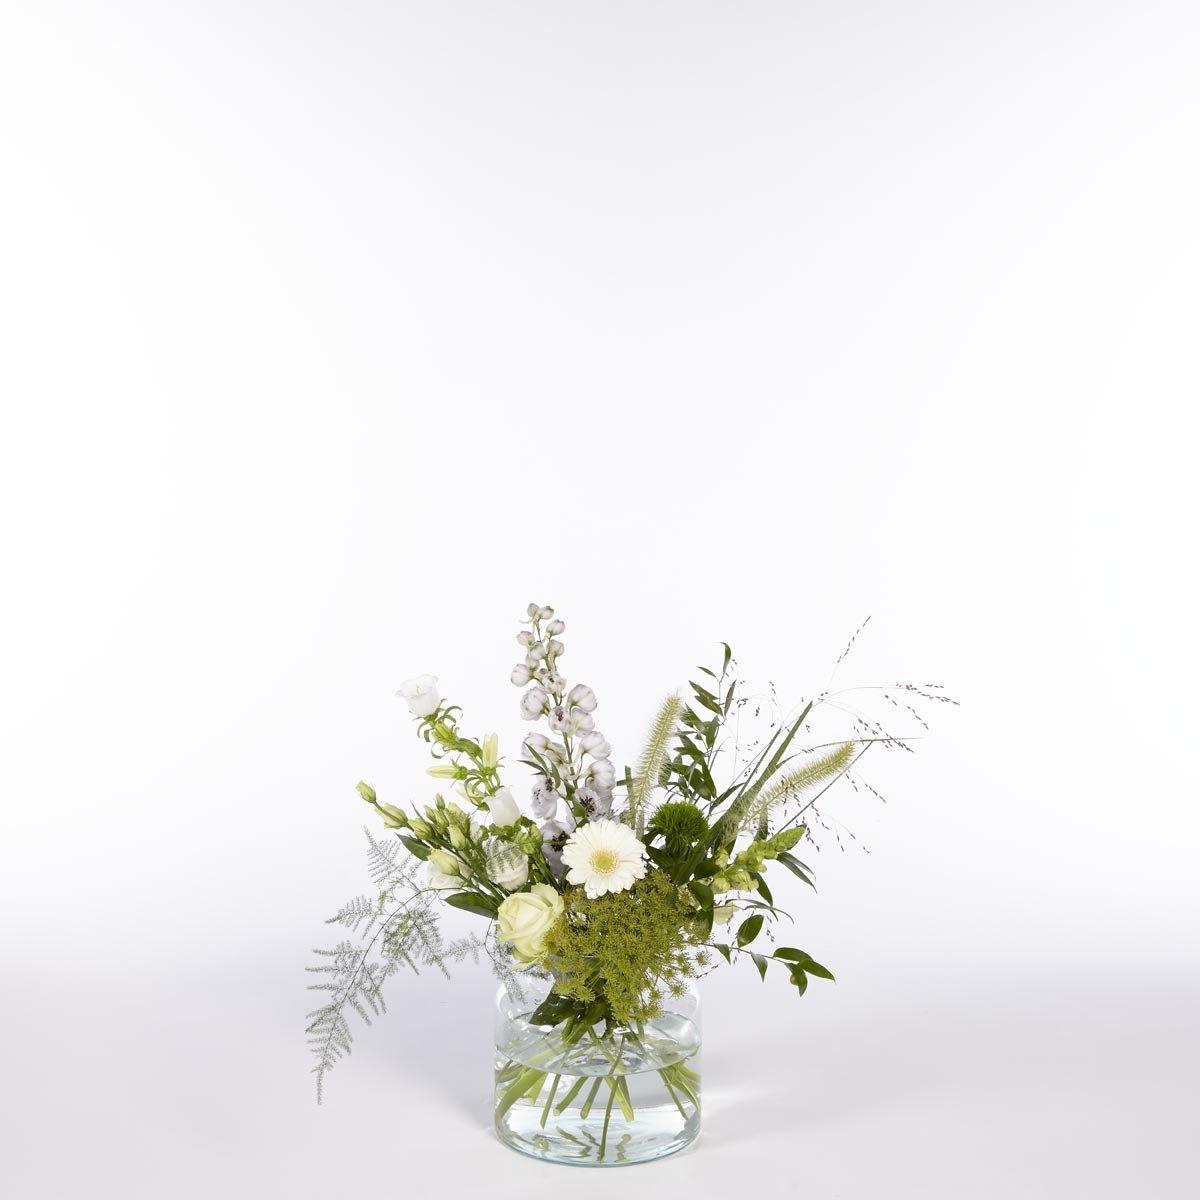 Veens bloemetje Leonie (Small)